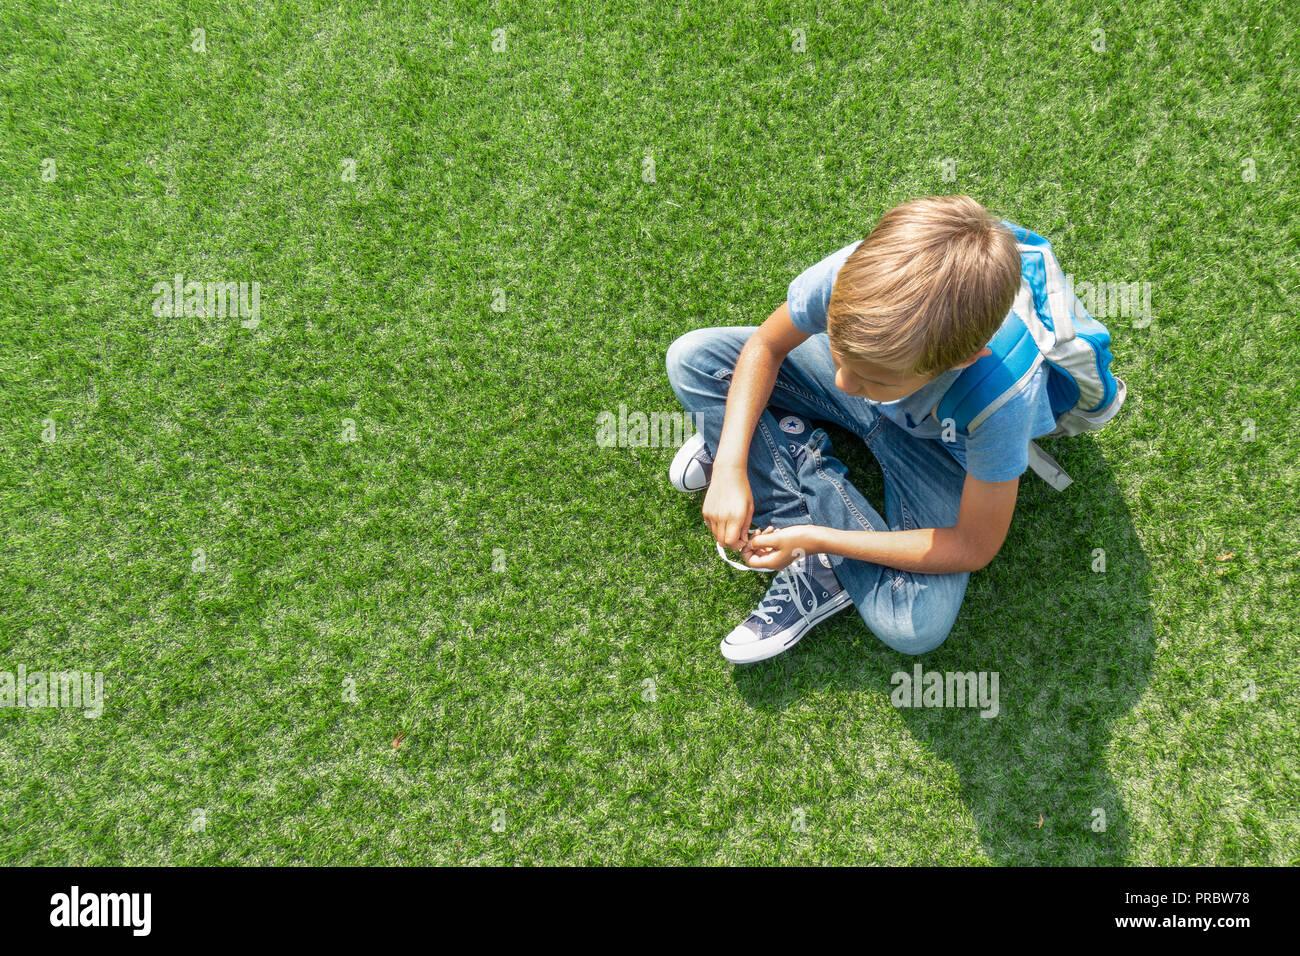 Unhappy sad upset boy sitting alone on the grass - Stock Image